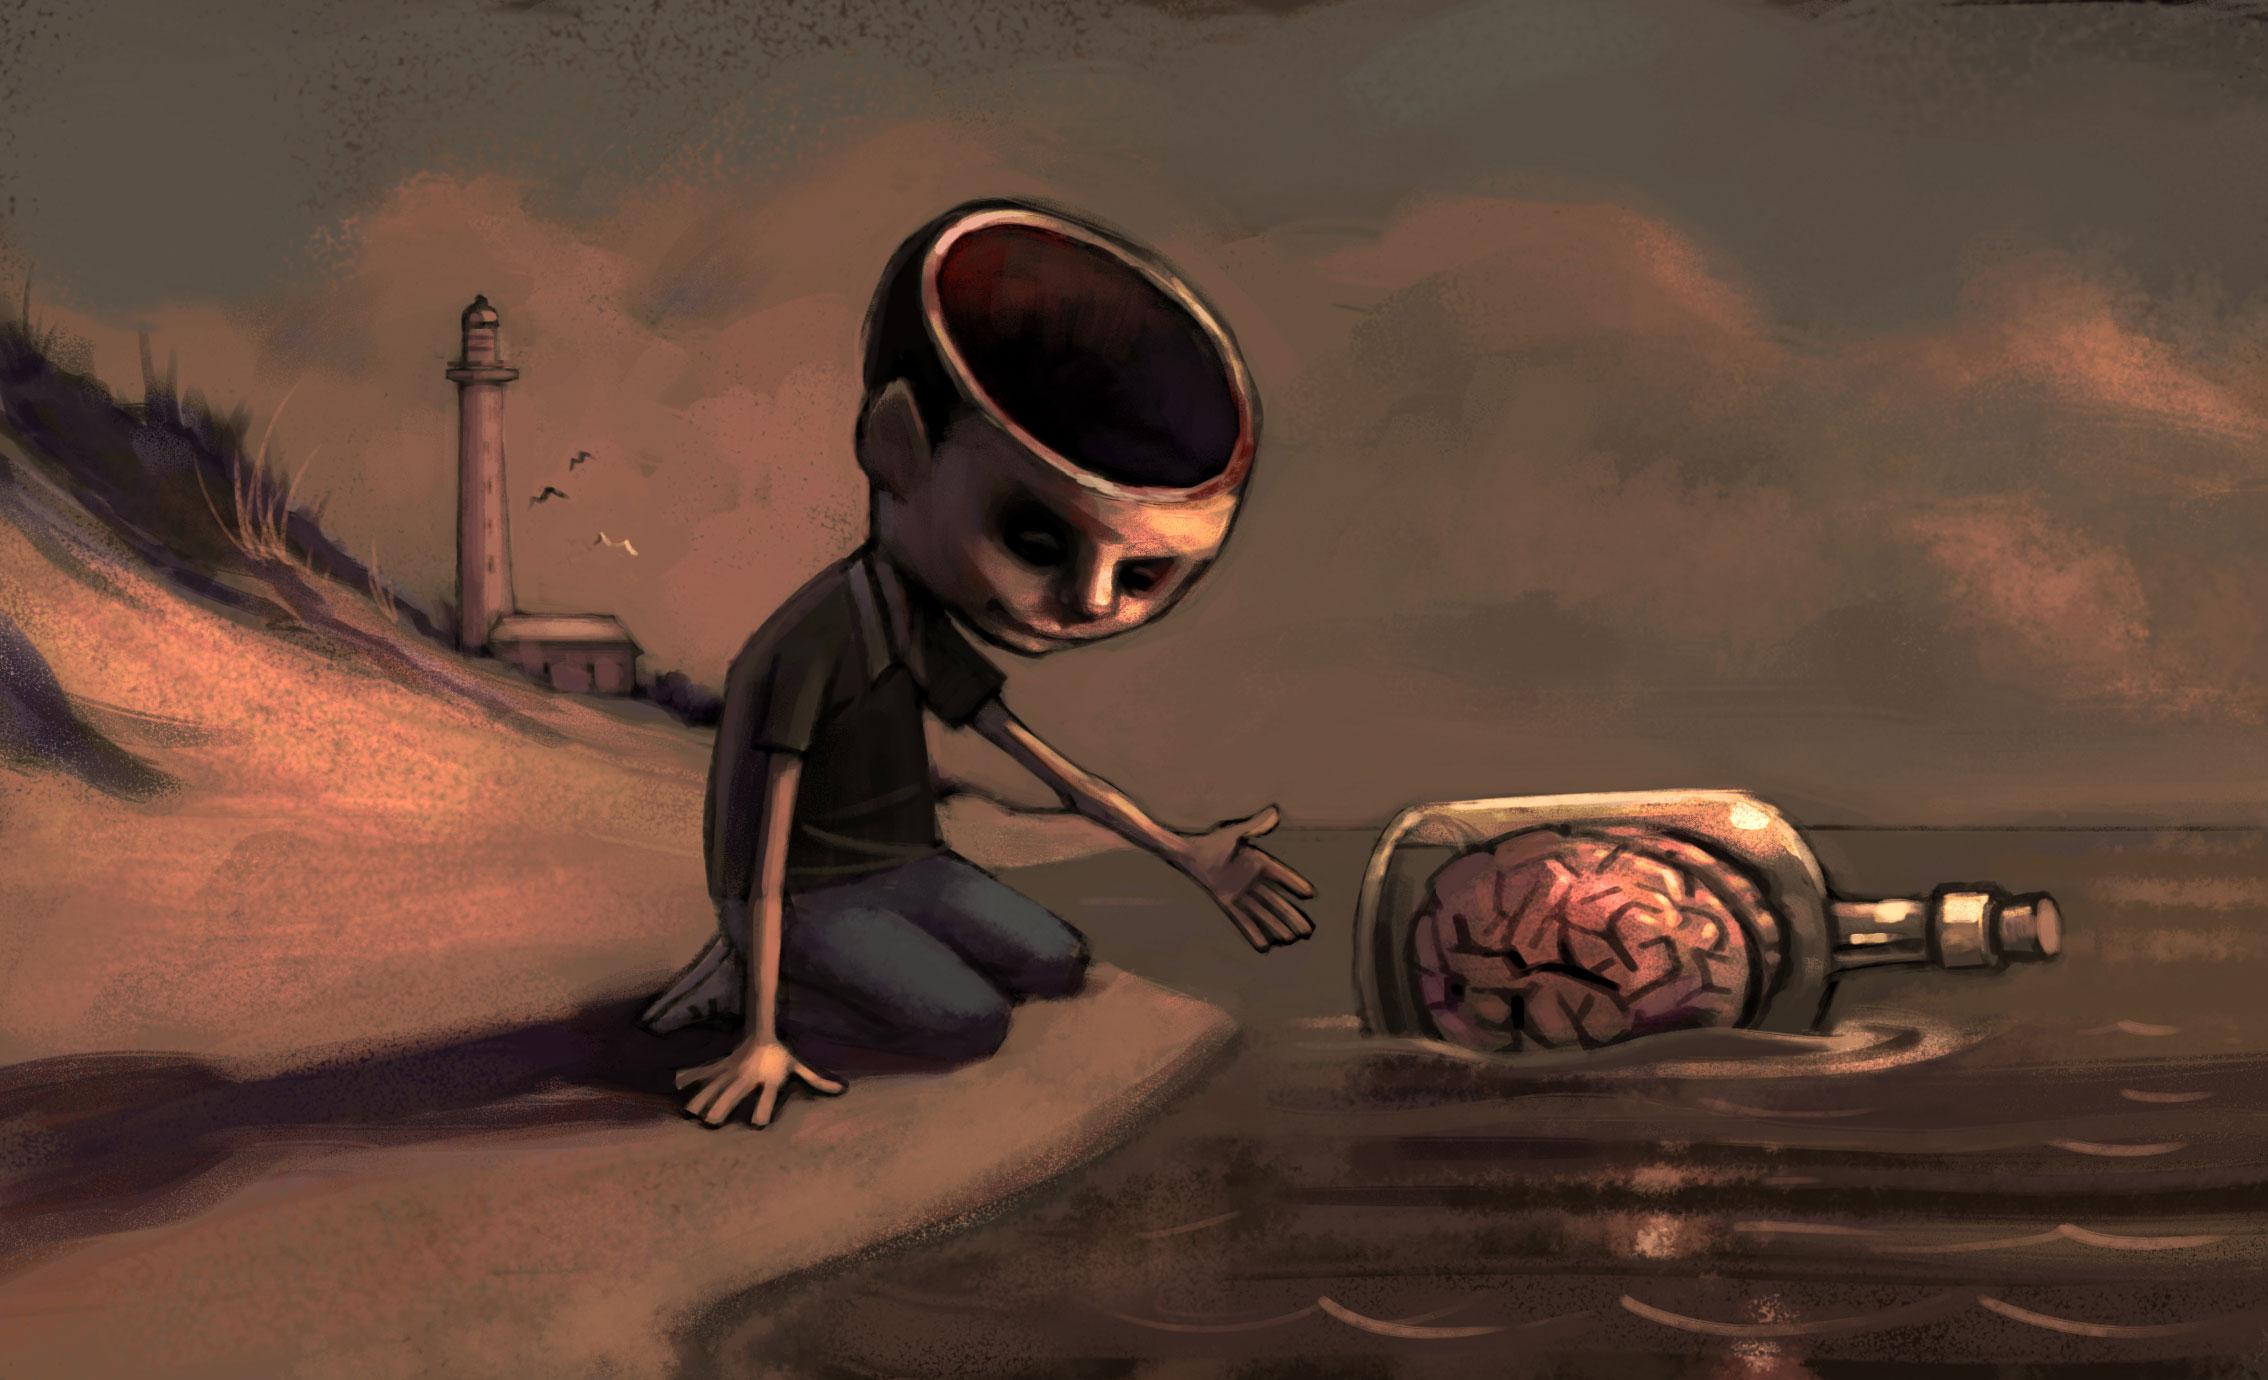 Brainboat